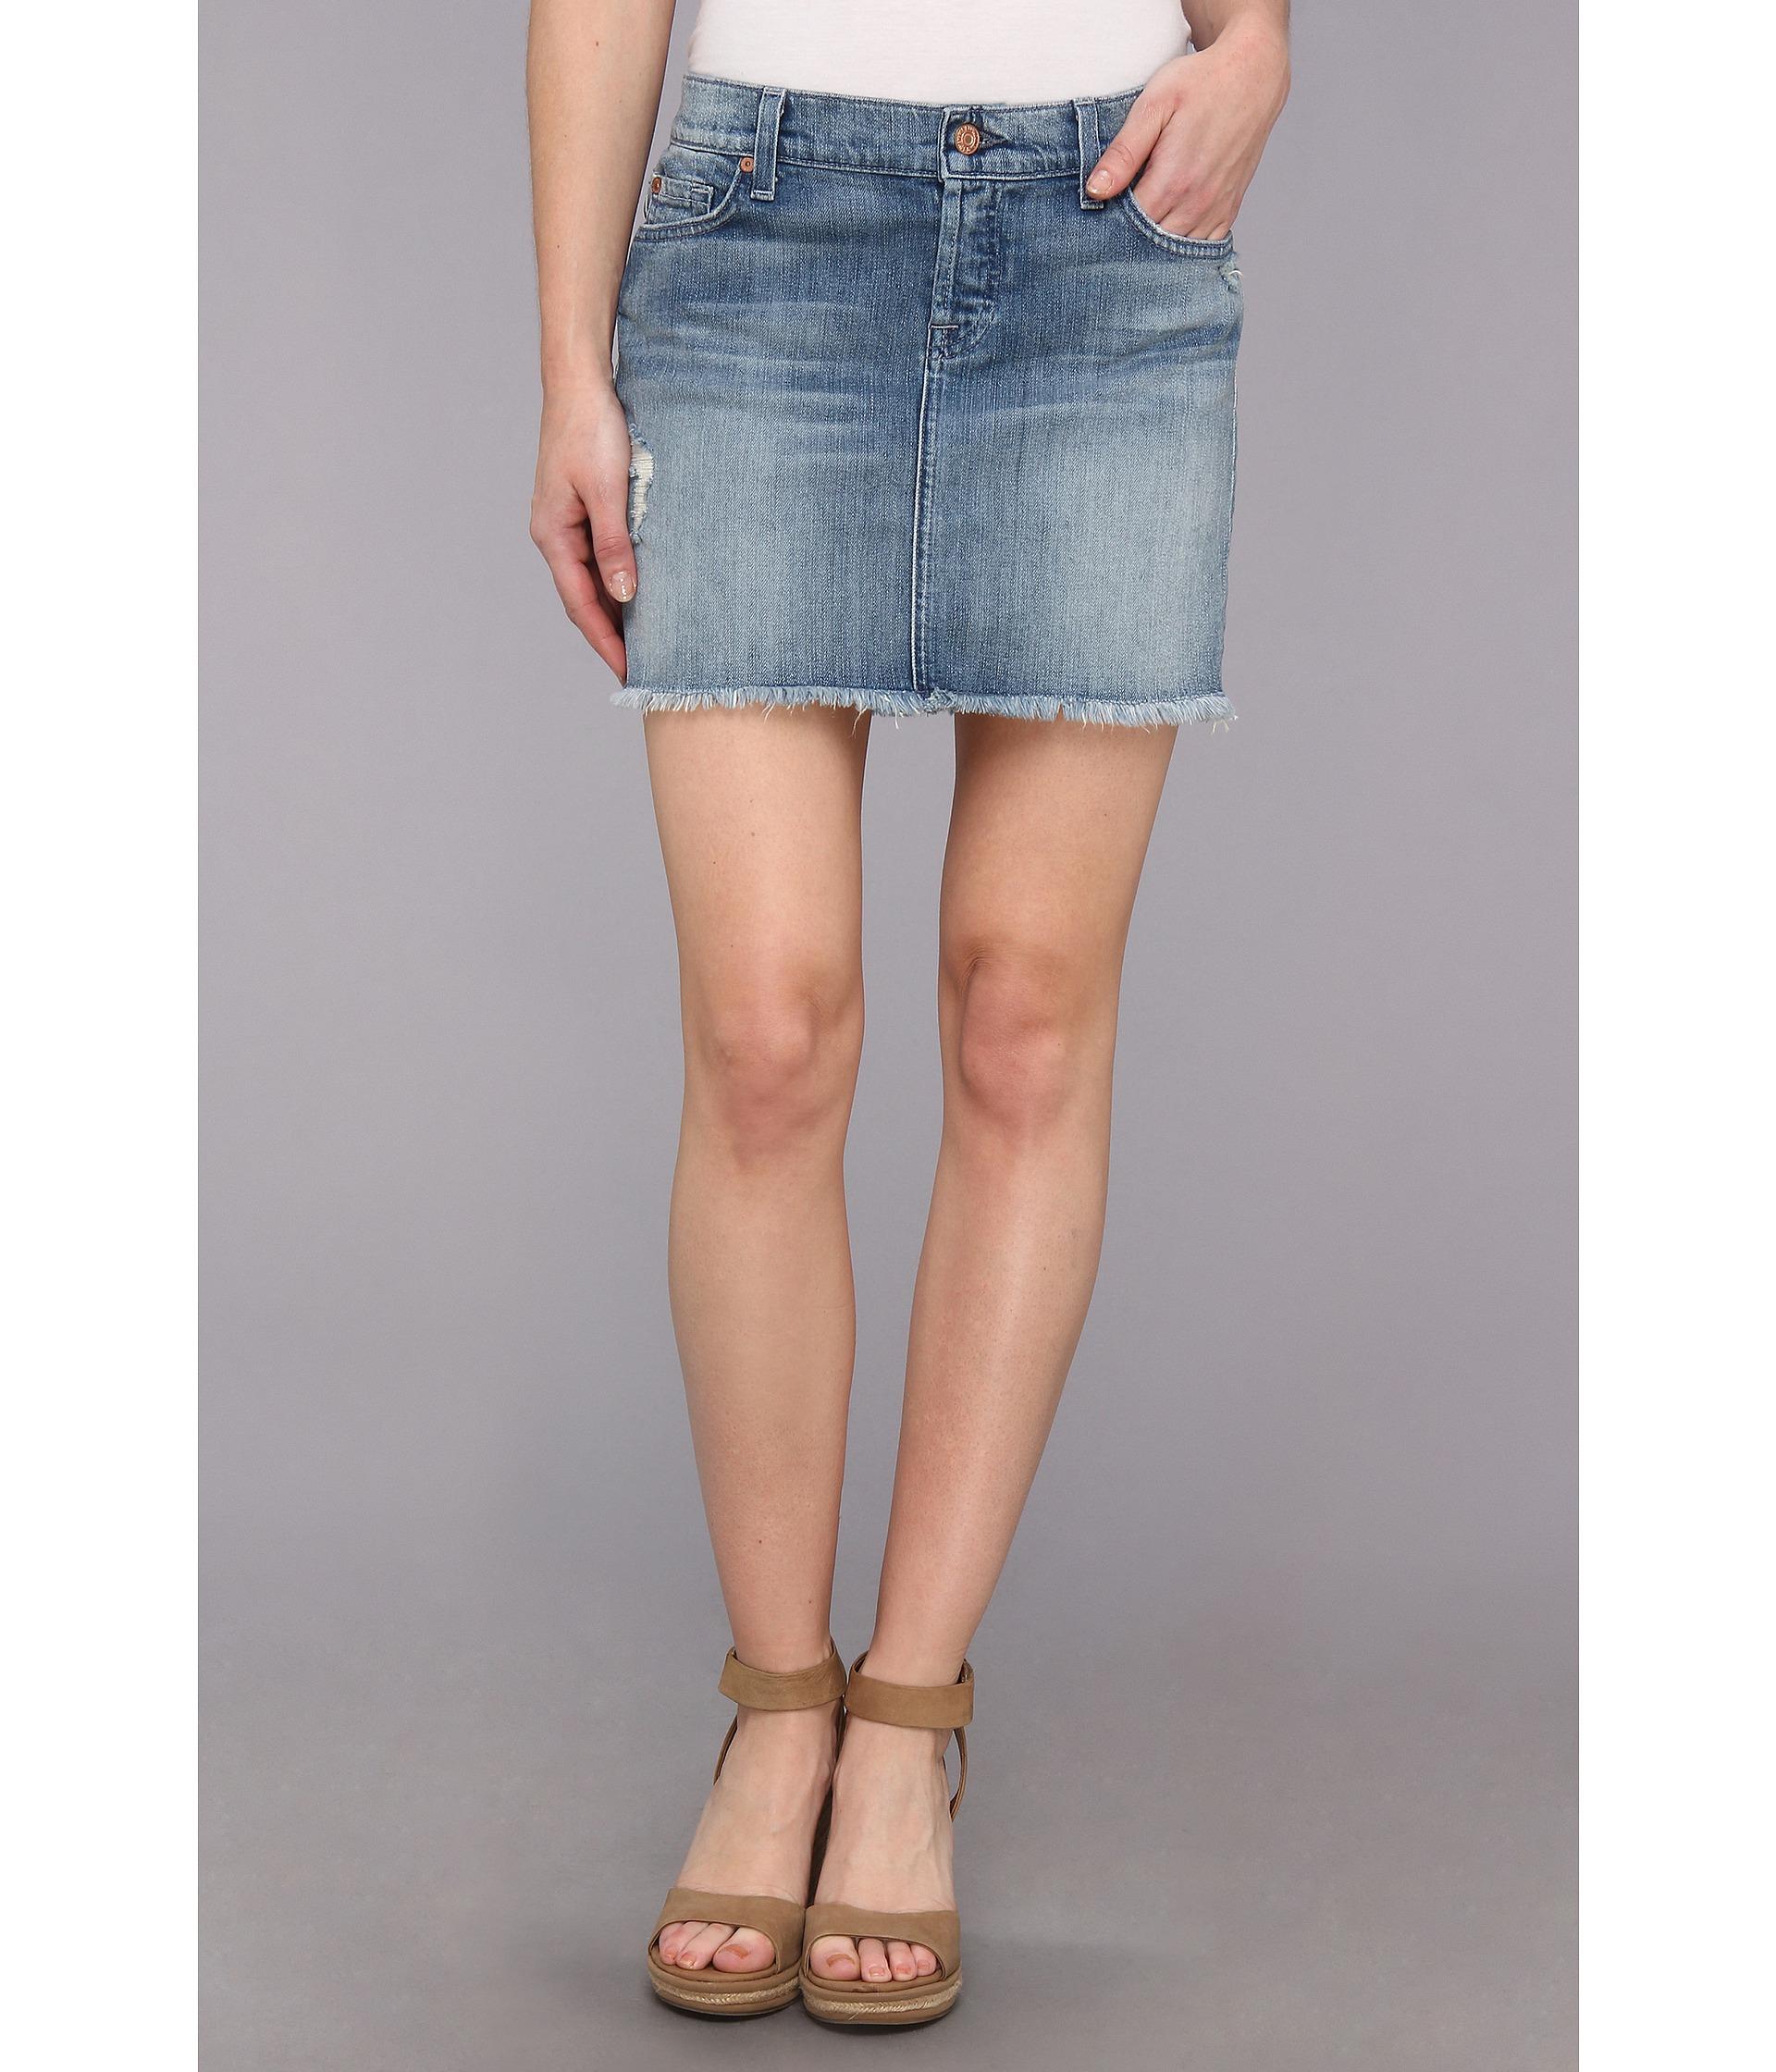 Lyst - 7 For All Mankind Josefina Mini Skirt W Raw Hem in Authentic  Oceanside in Blue